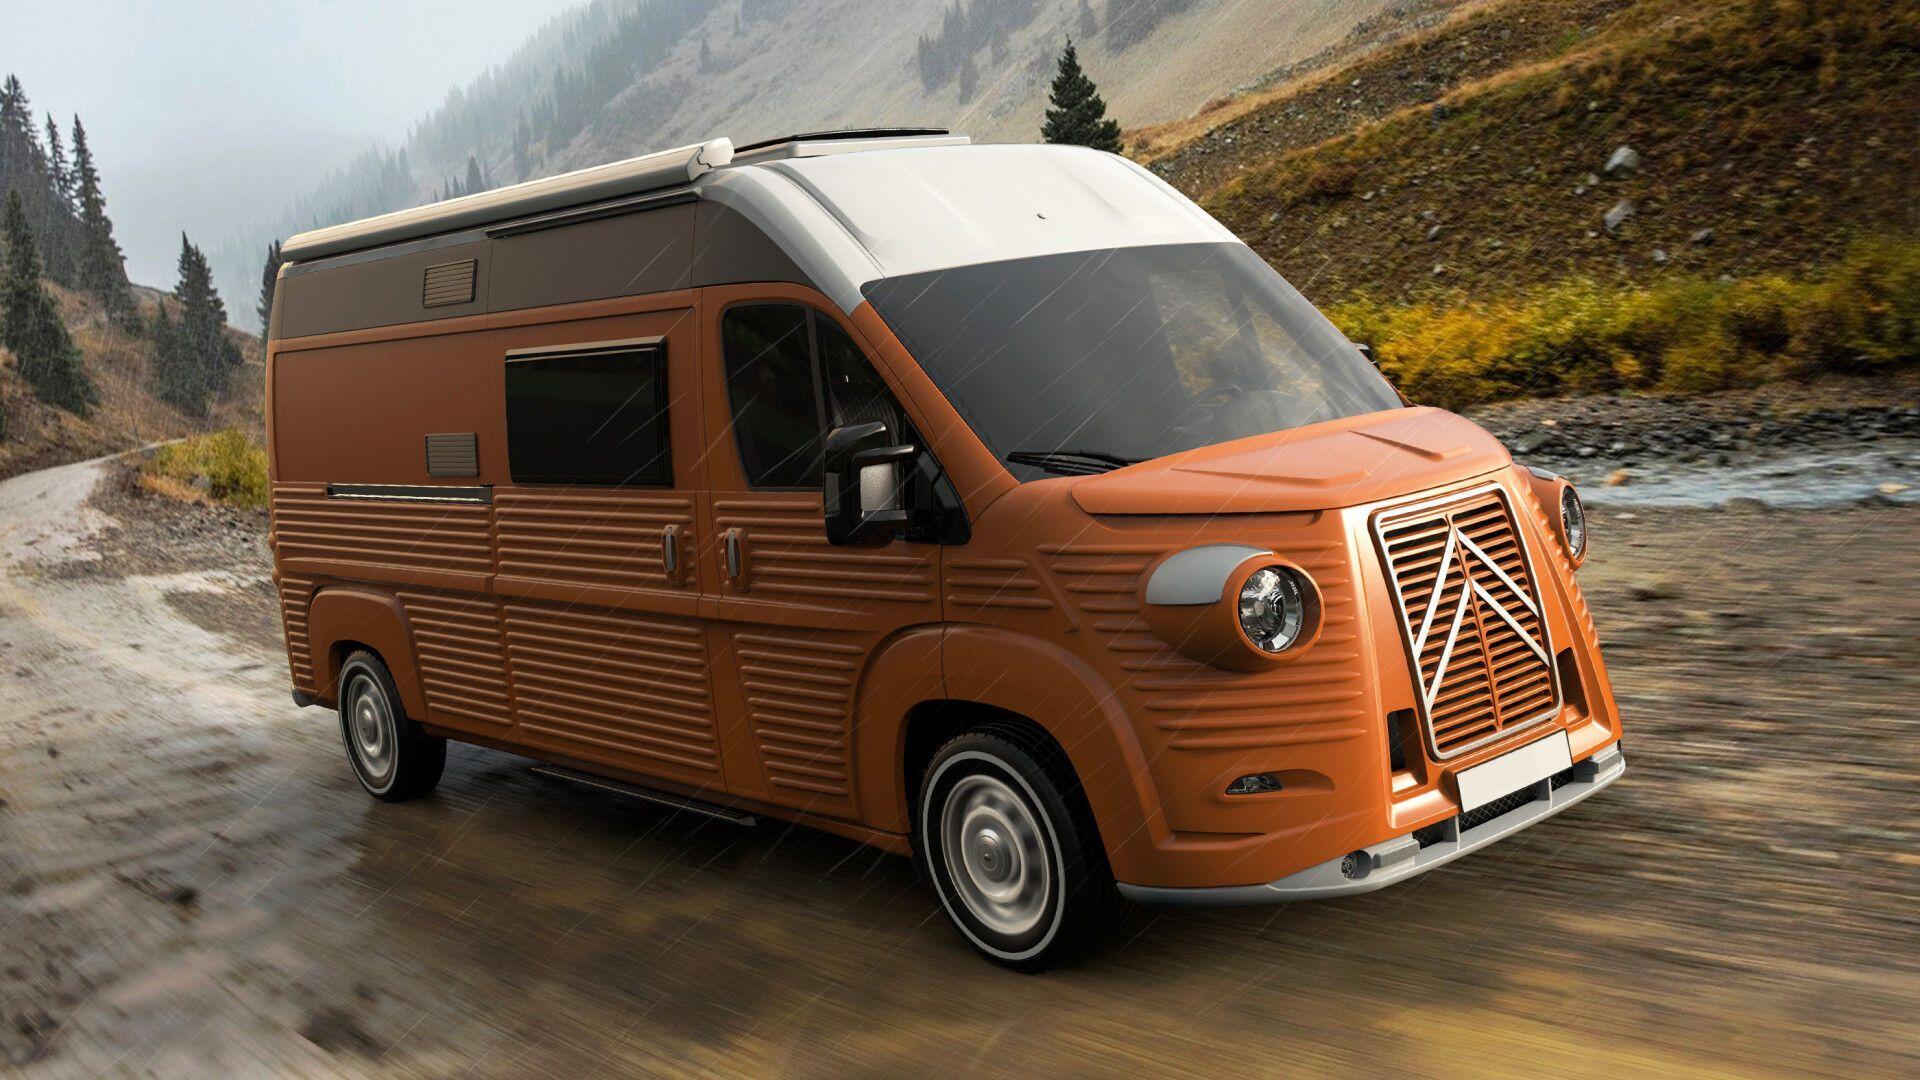 Вантажно-пасажирський фургон Carrosserie Caselani Type H. Фото: